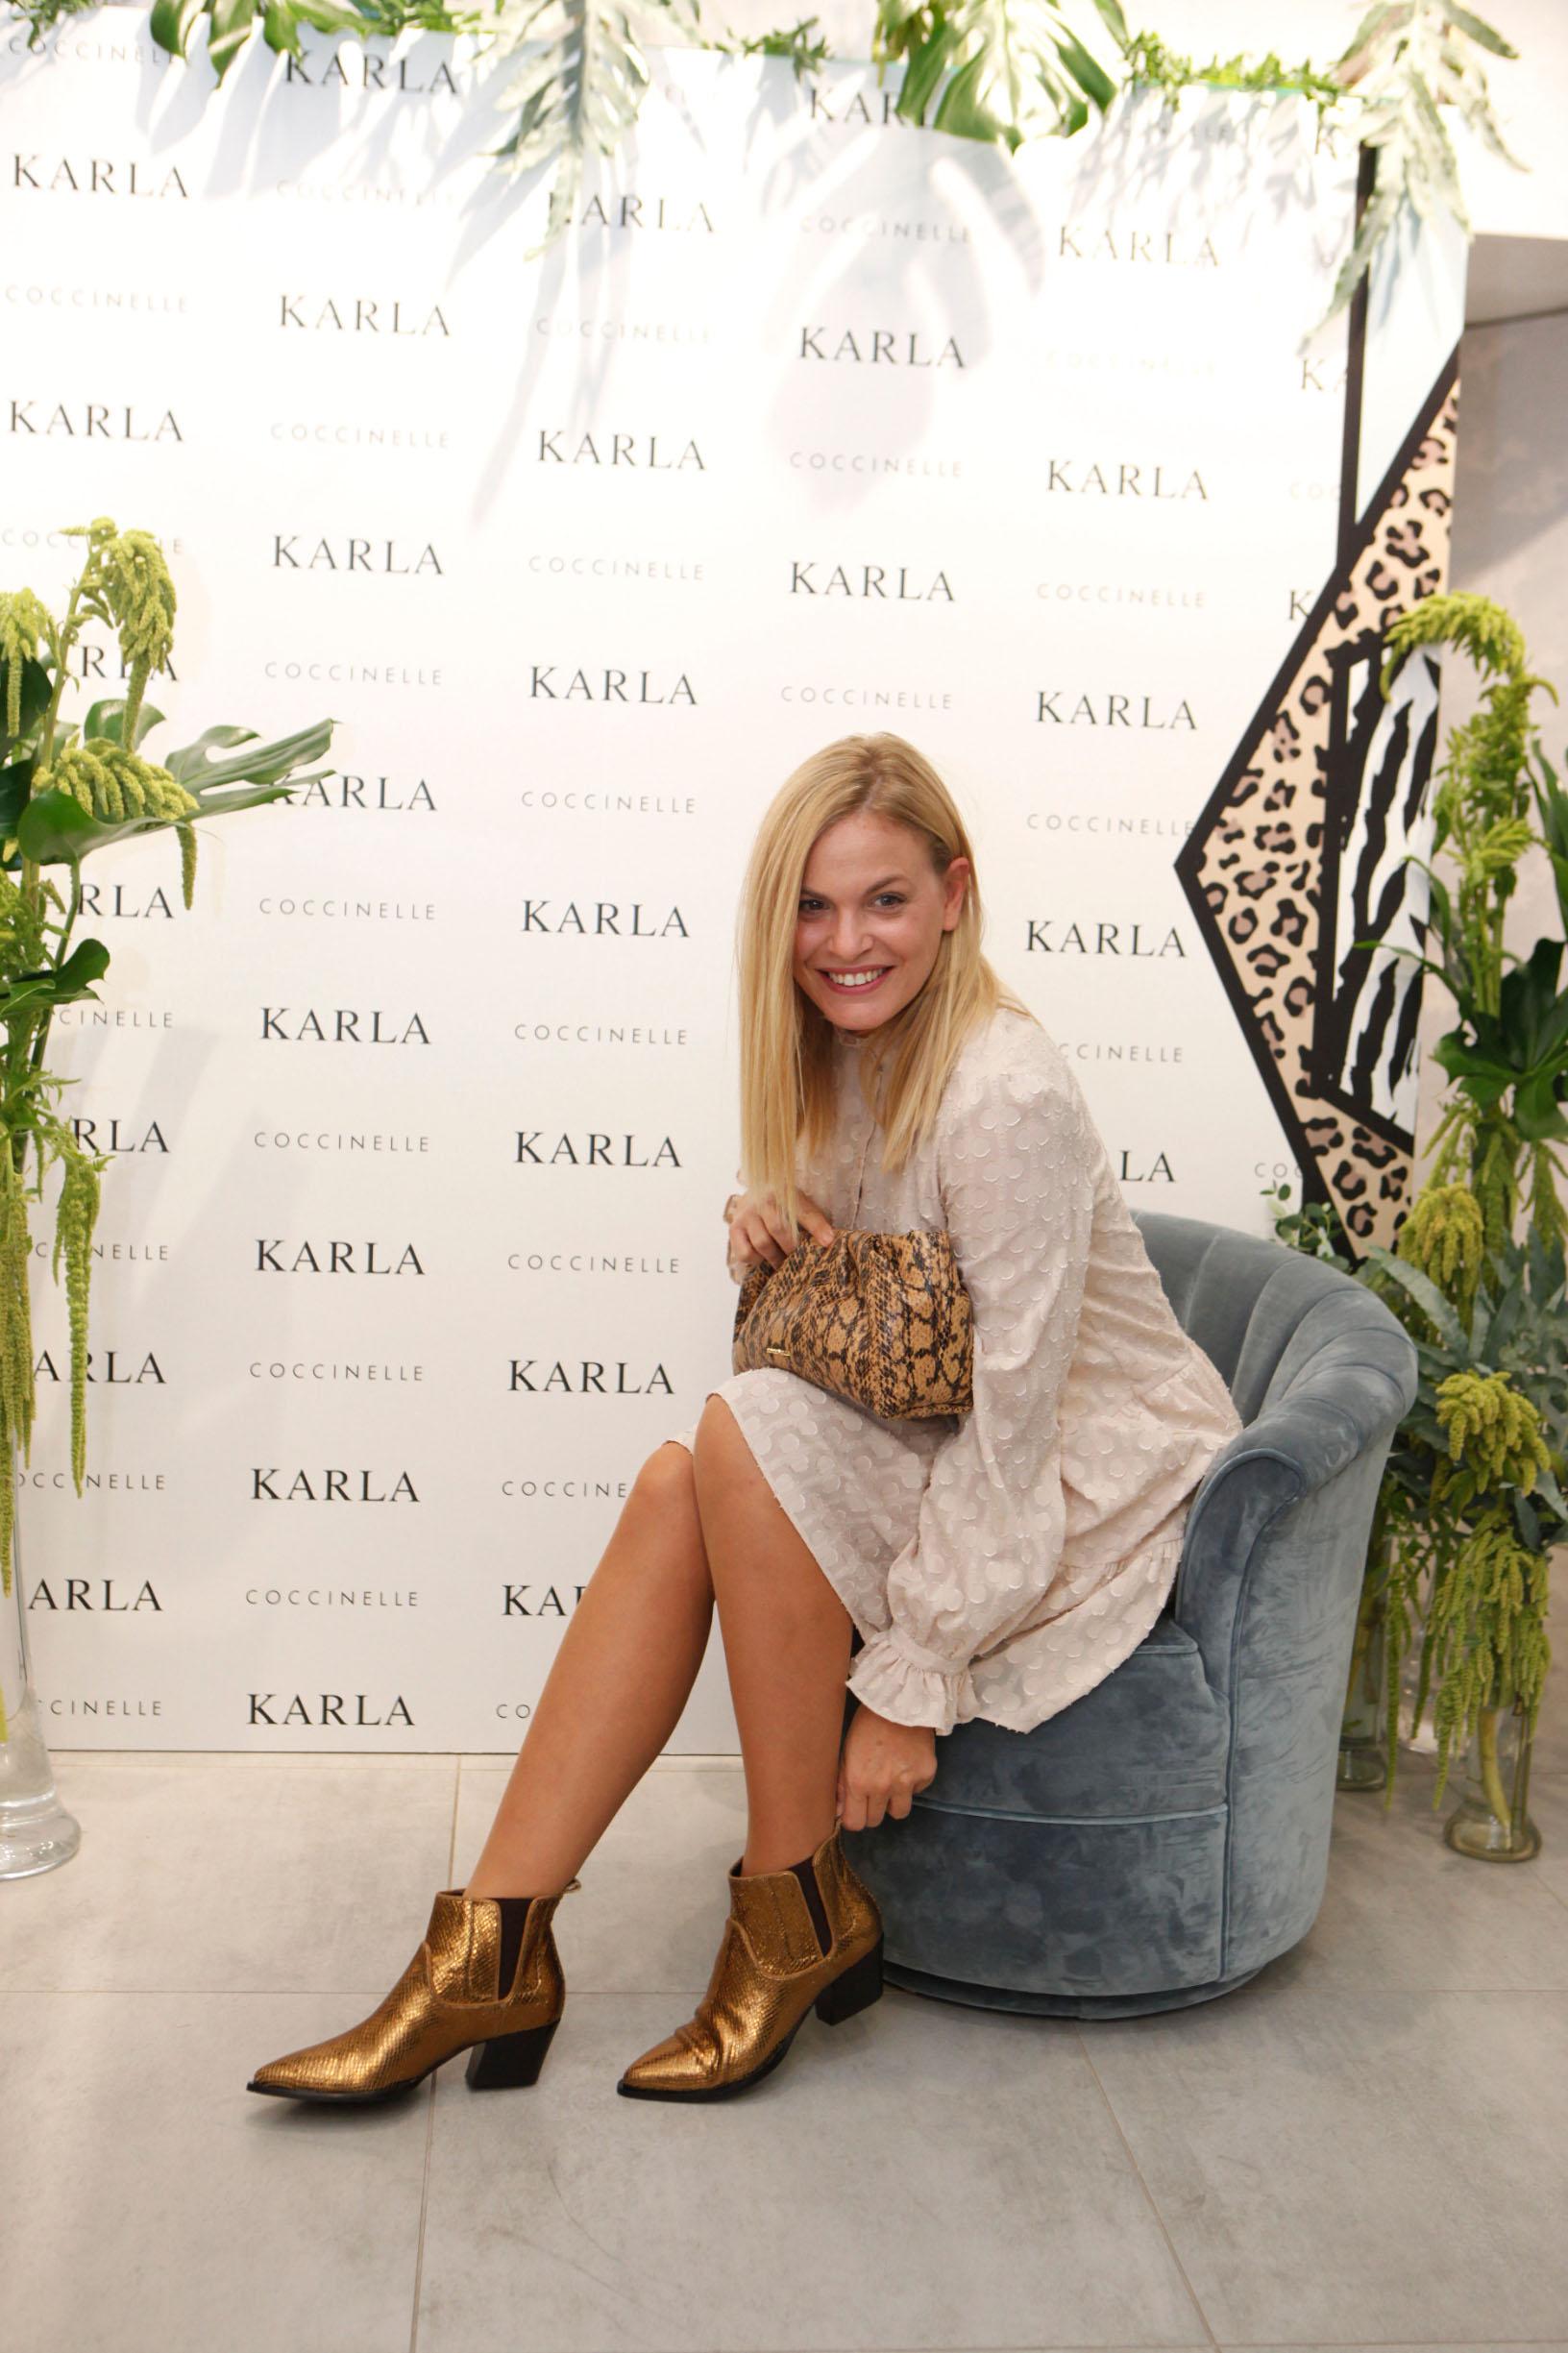 otvorenje preuredjenog butika za cipele Karla te promocija Gloria Glam casopisa / Karla / Zagreb 19.10.2019. / foto: Maja jurovic / Nevena Rendeli Vejzovic